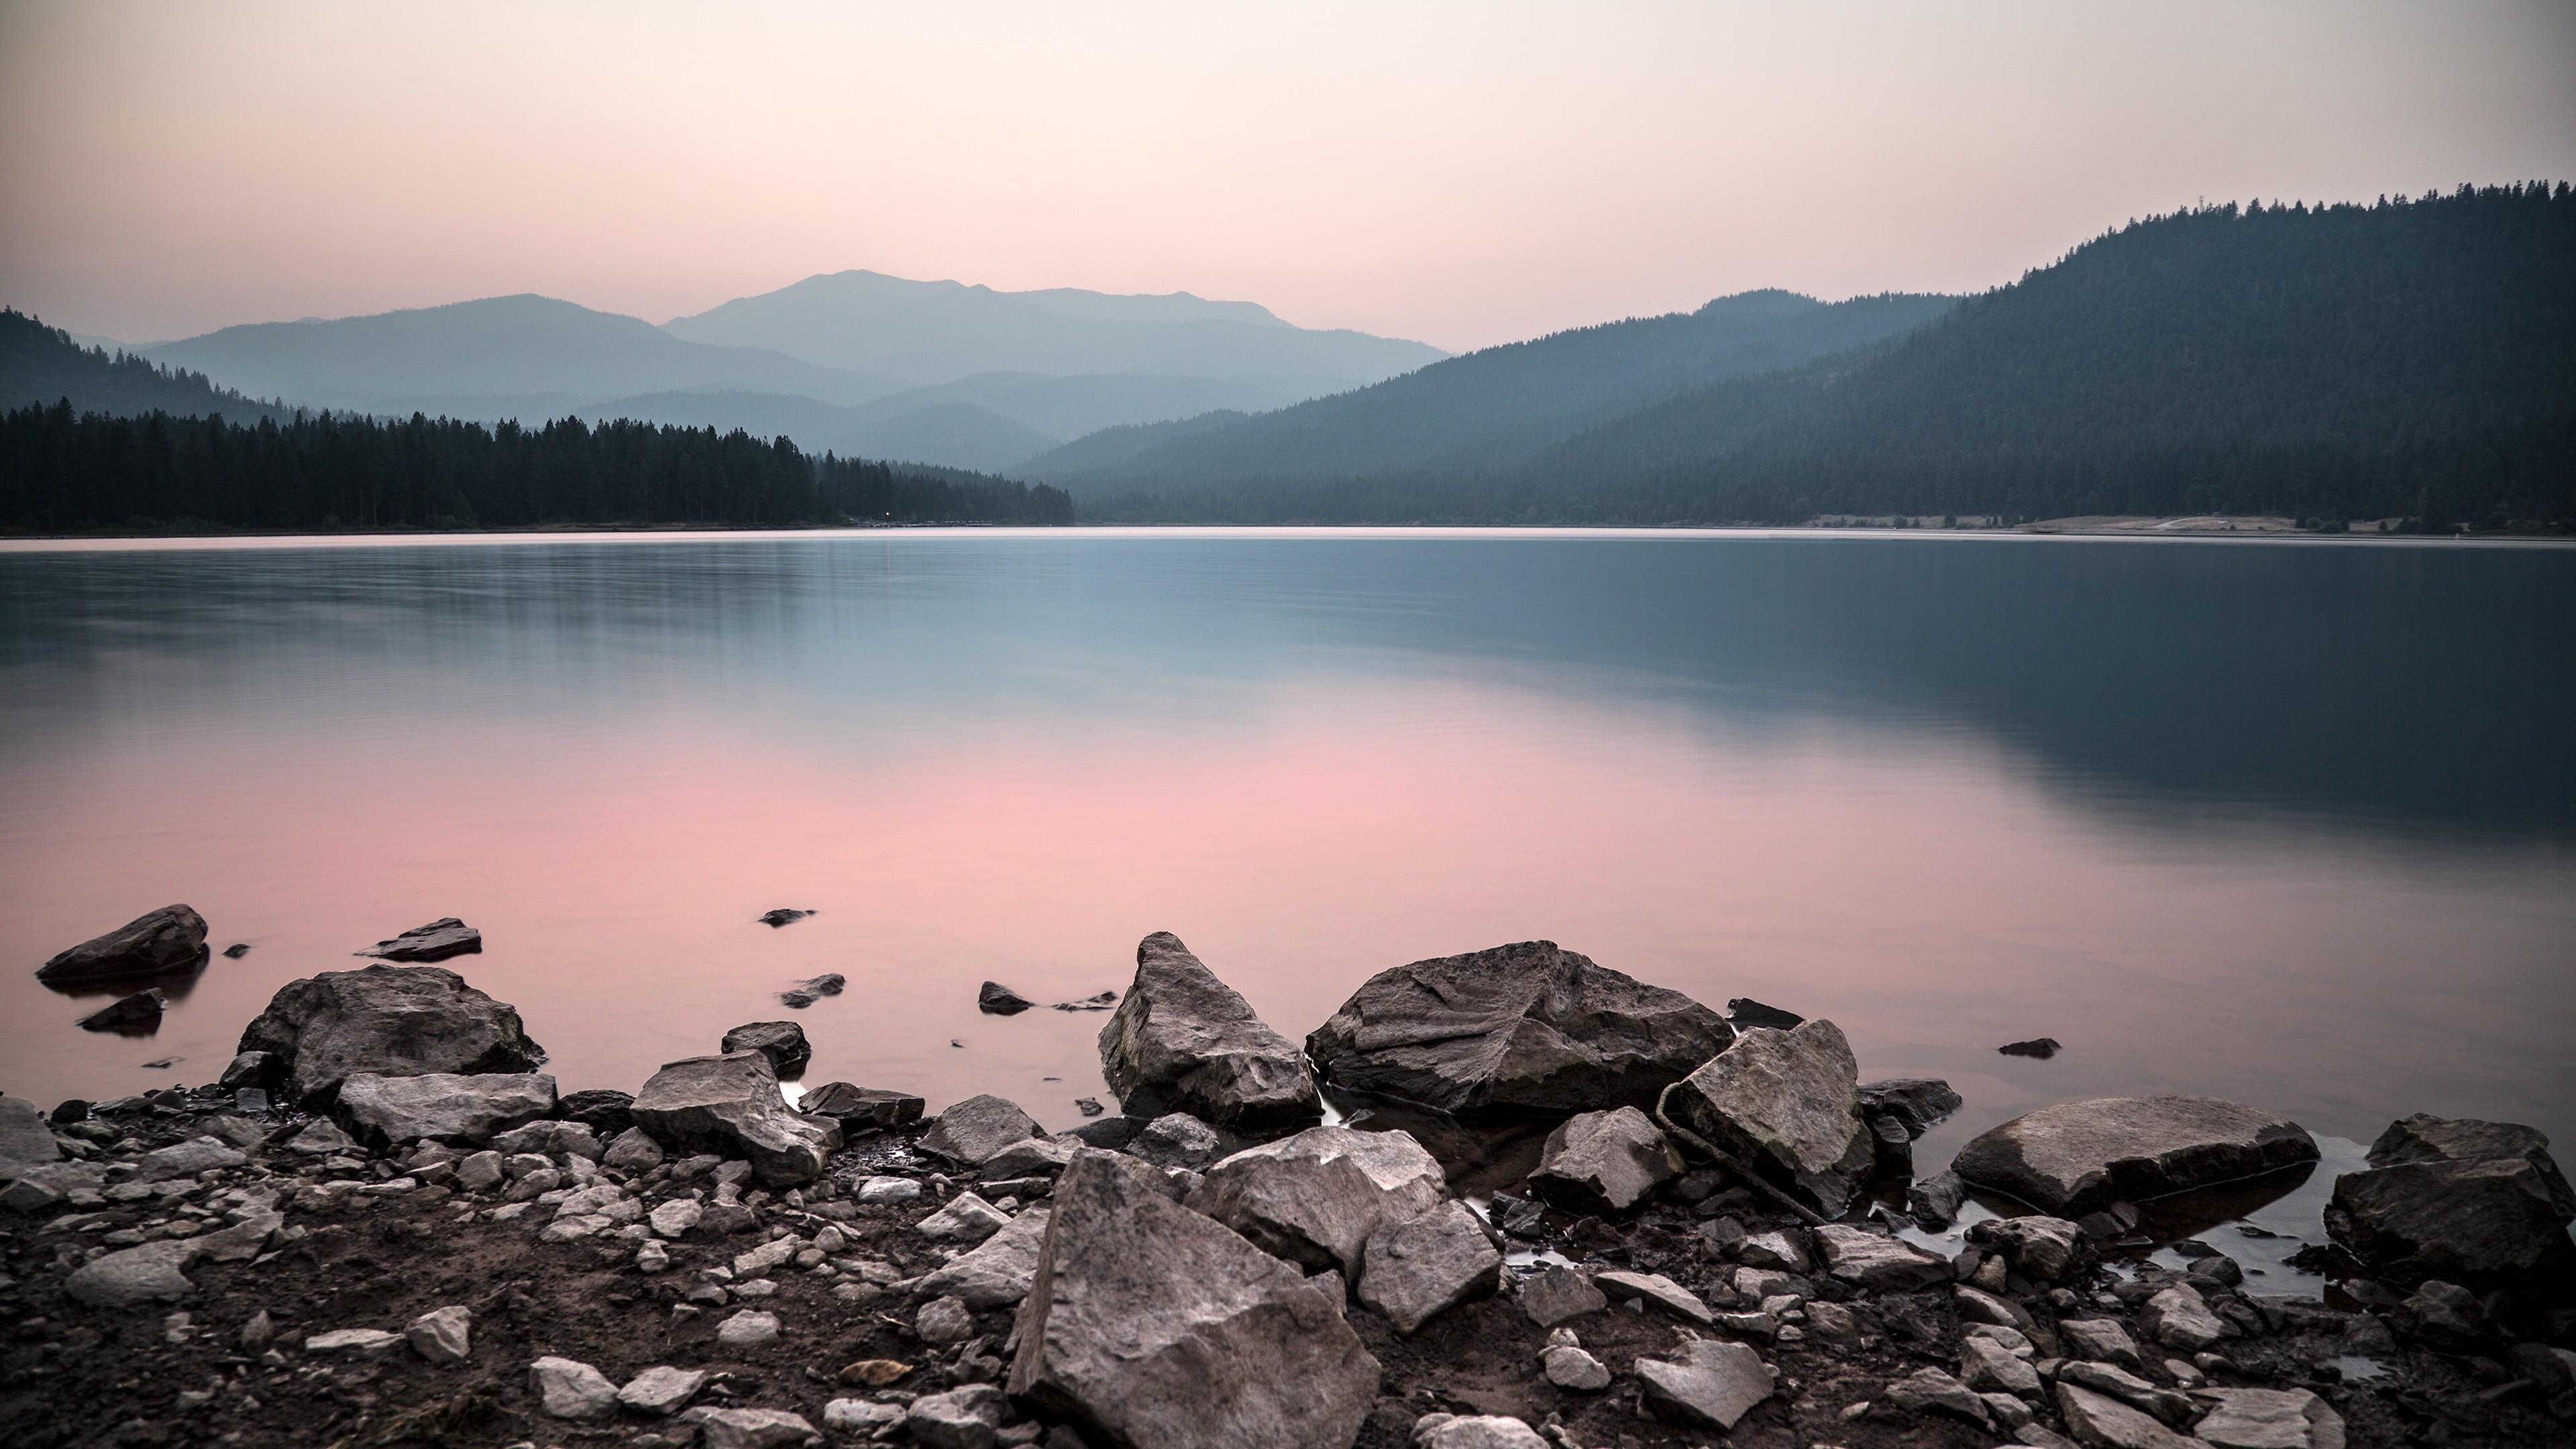 Res: 3840x2160, Calm Mountain Lake 4K Ultra HD Desktop Wallpaper Uploaded by DesktopWalls